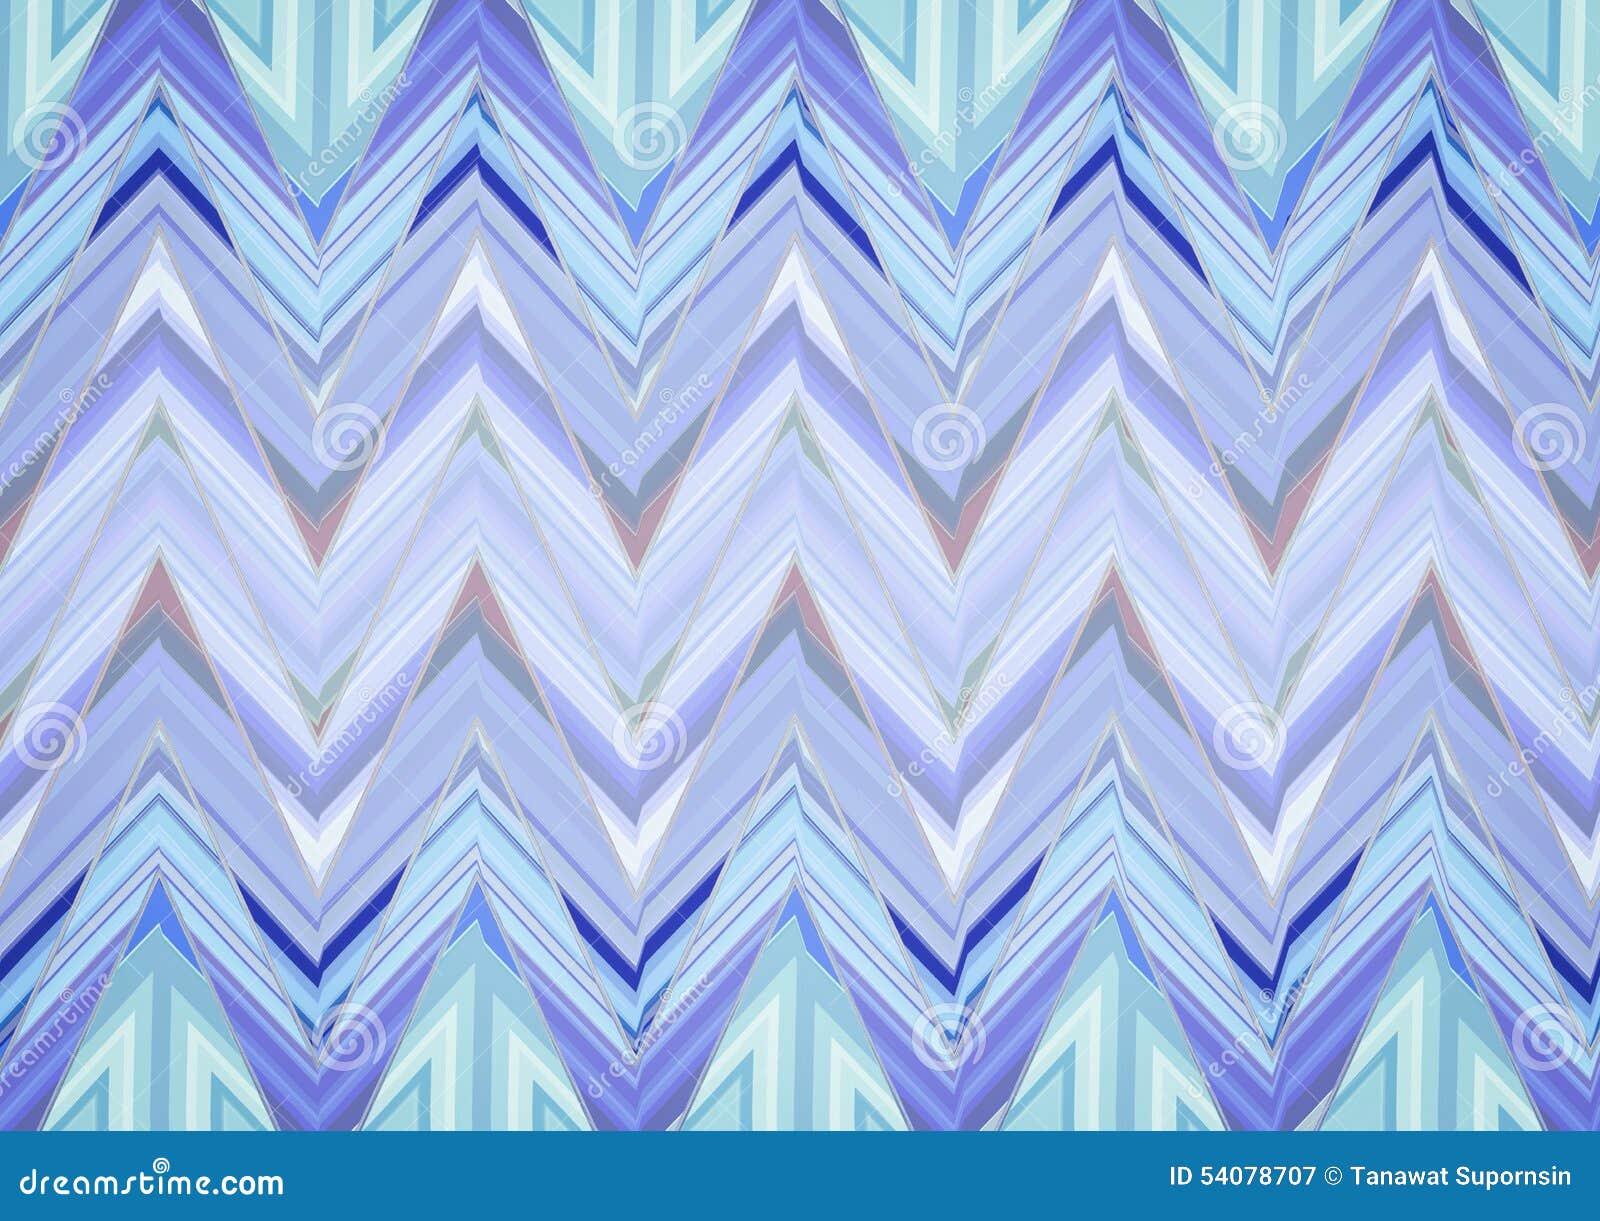 Abstract Blauw Zigzagpatroon